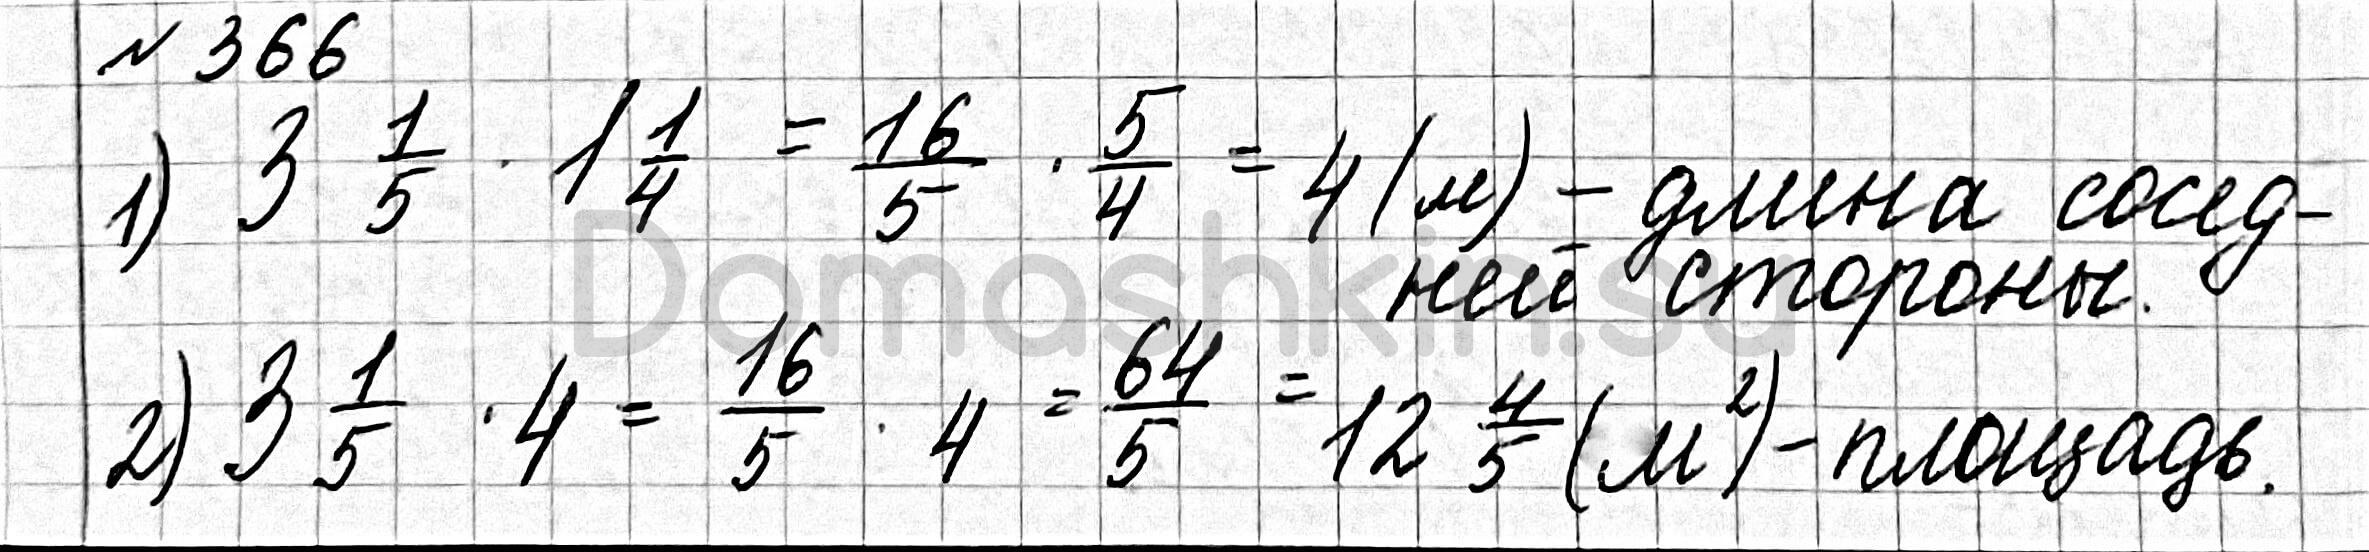 Математика 6 класс учебник Мерзляк номер 366 решение